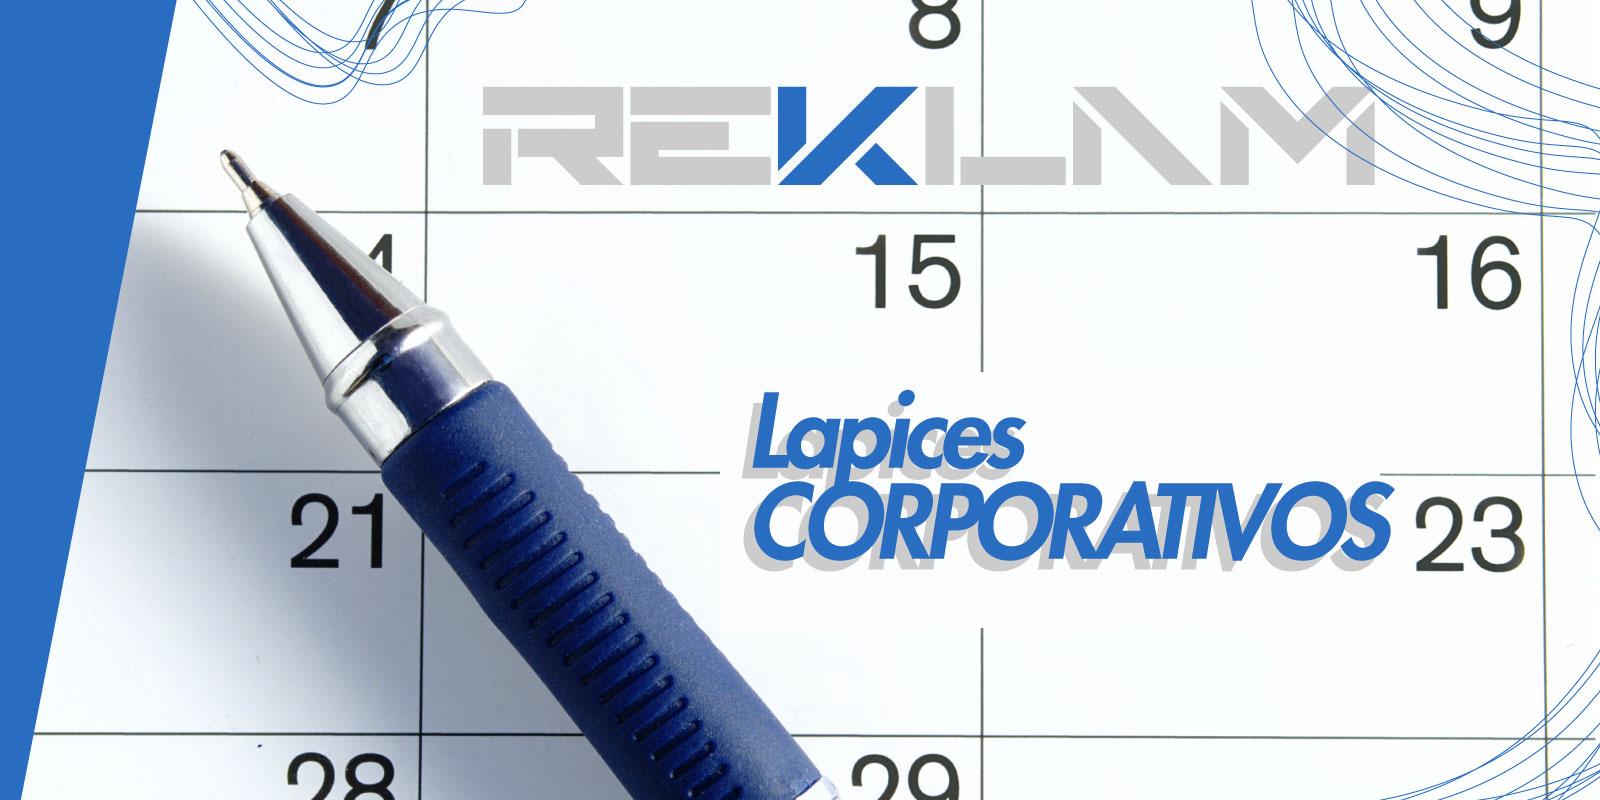 Lapices corporativos